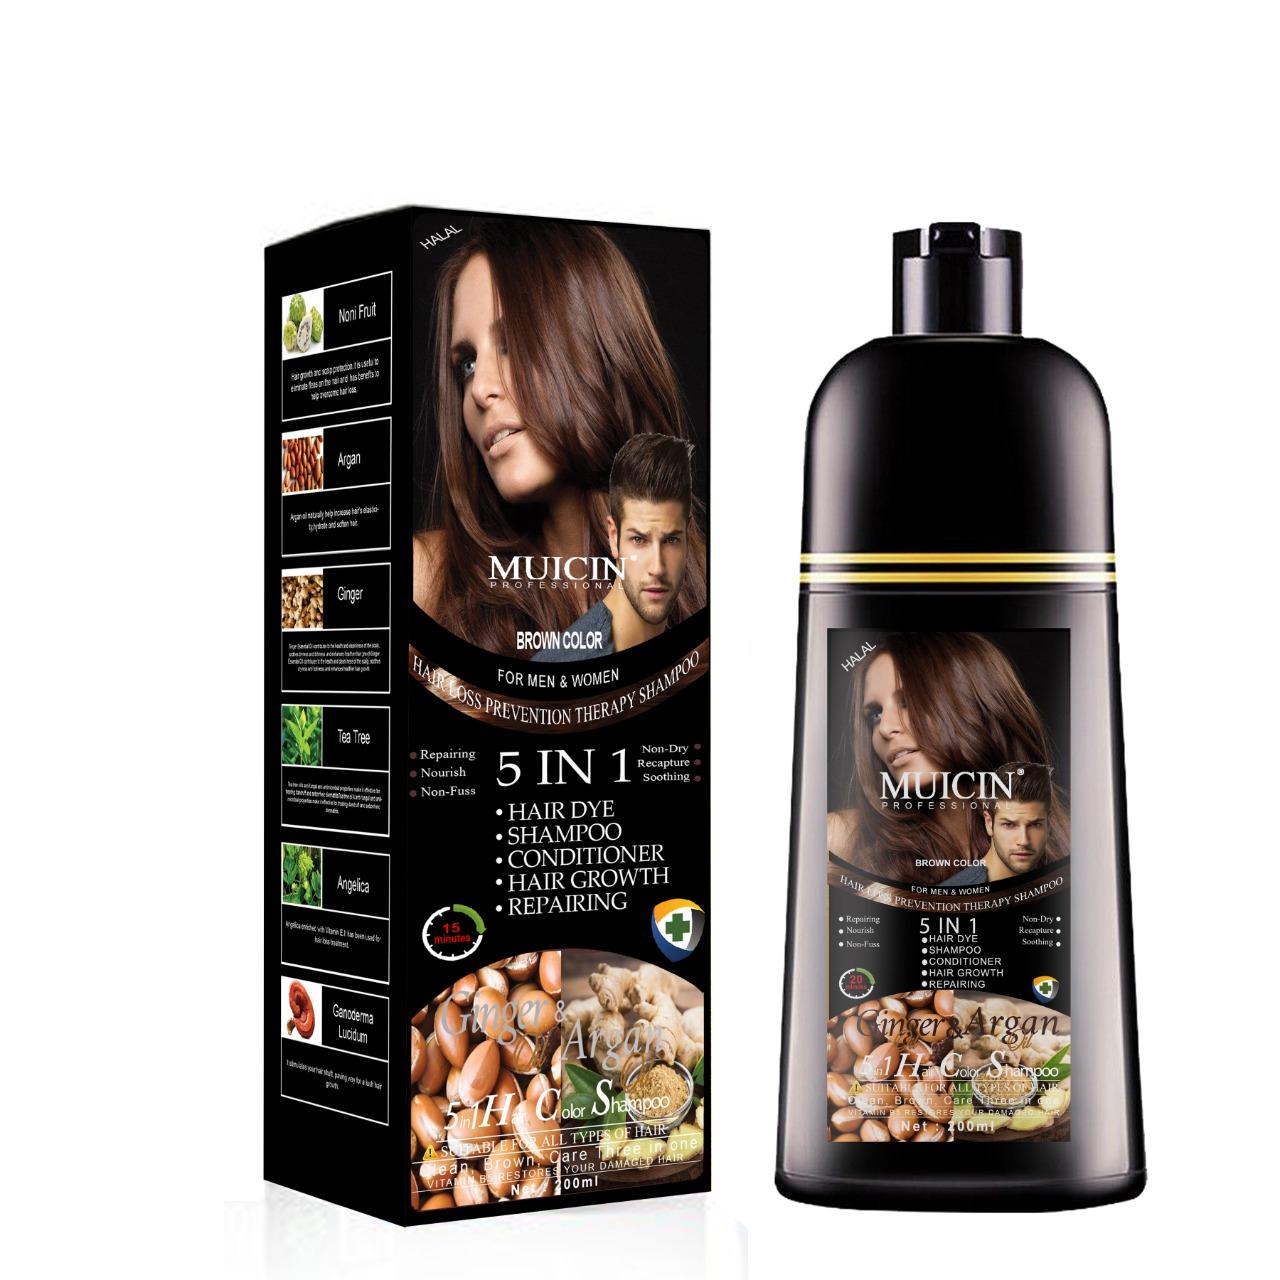 Muicin Brown 5 in 1 Hair Color Shampoo Ginger & Argan Oil 200 ML - For Men & Women